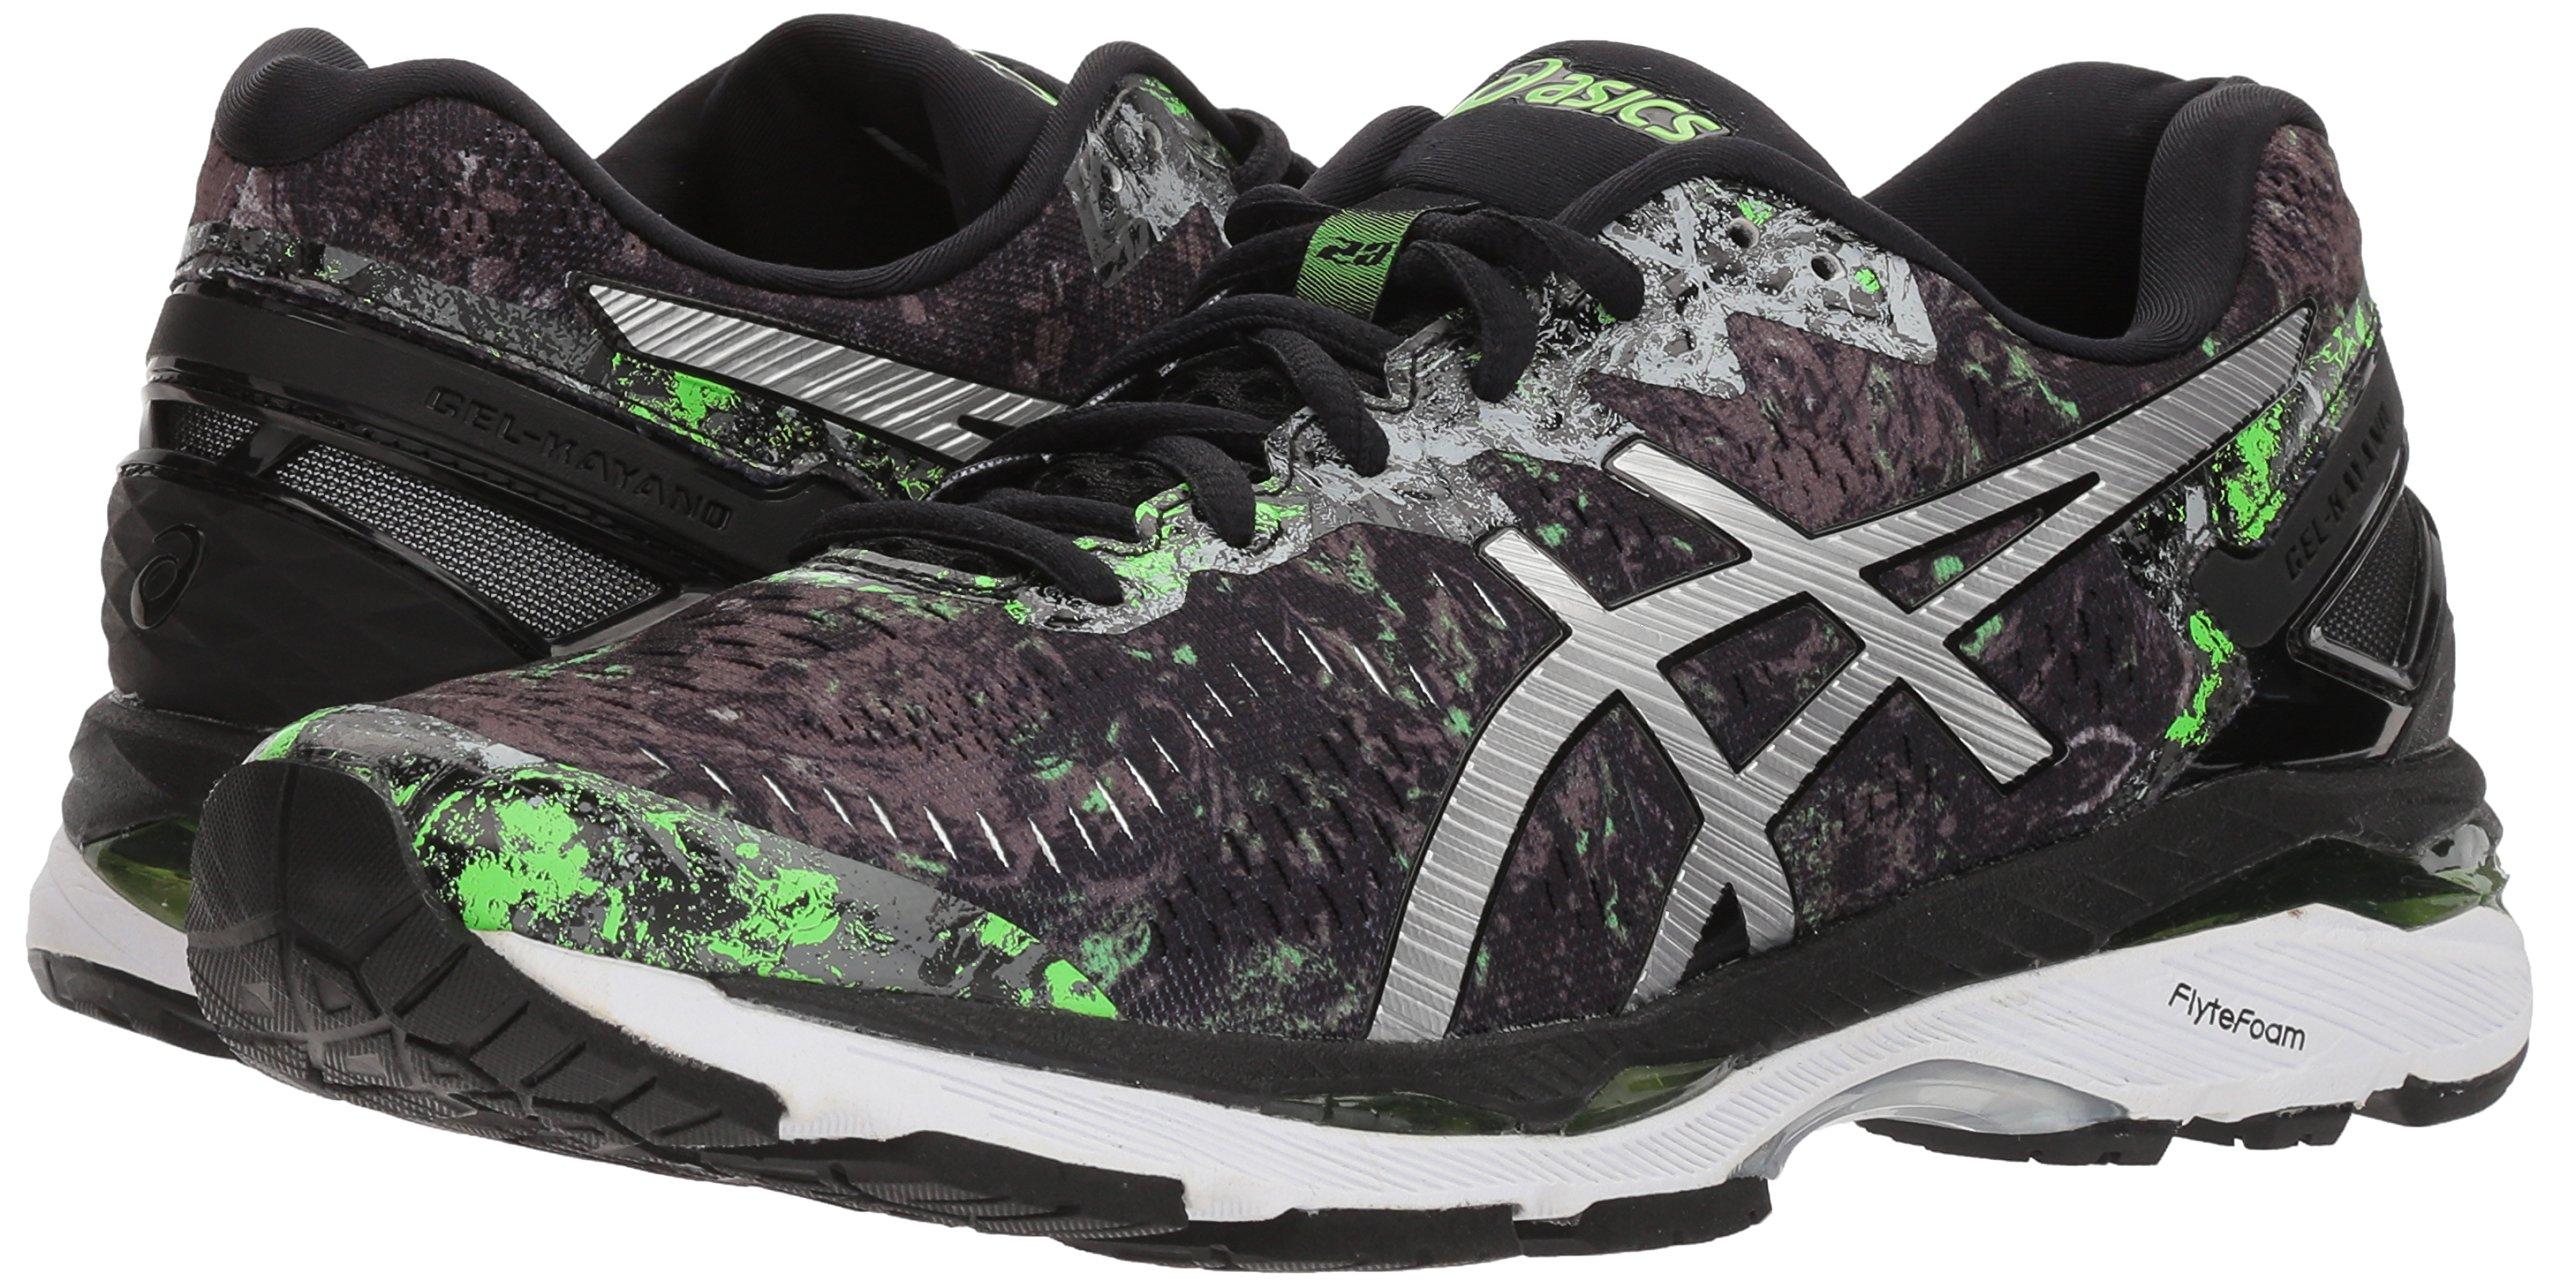 91gQrqOYxqL - ASICS Men's Gel-Kayano 23 Running Shoe